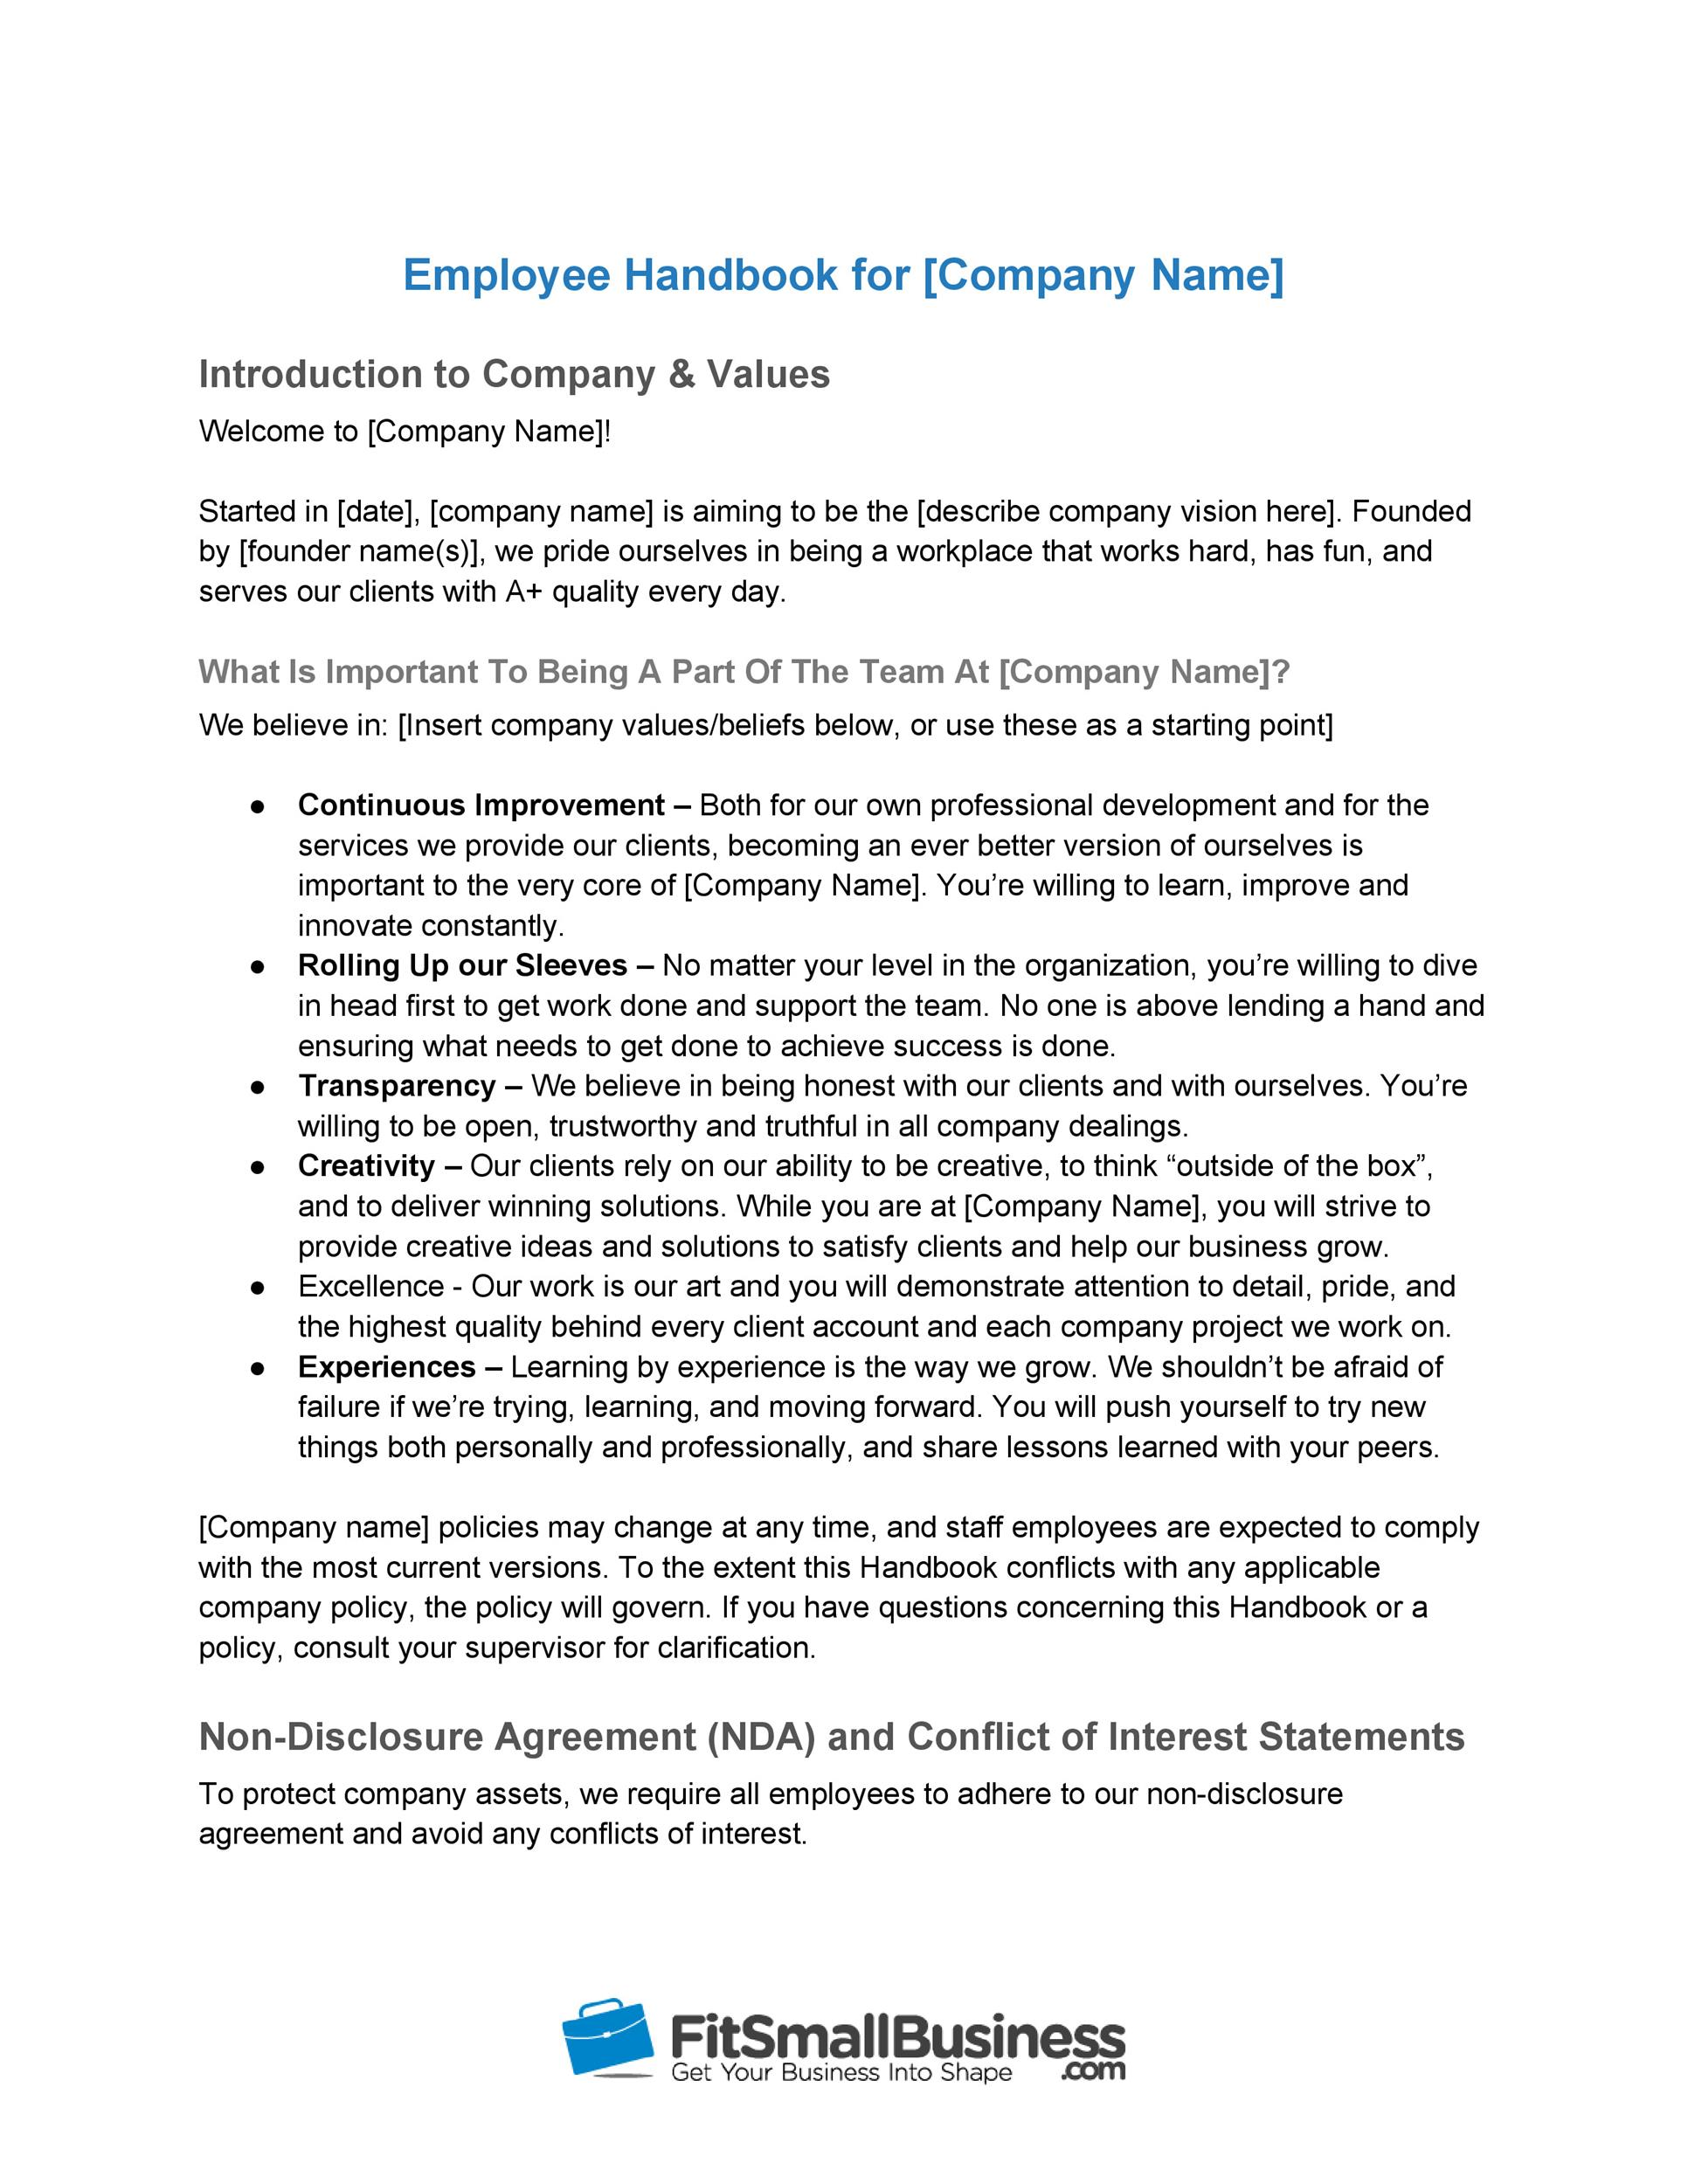 Free employee handbook template 04